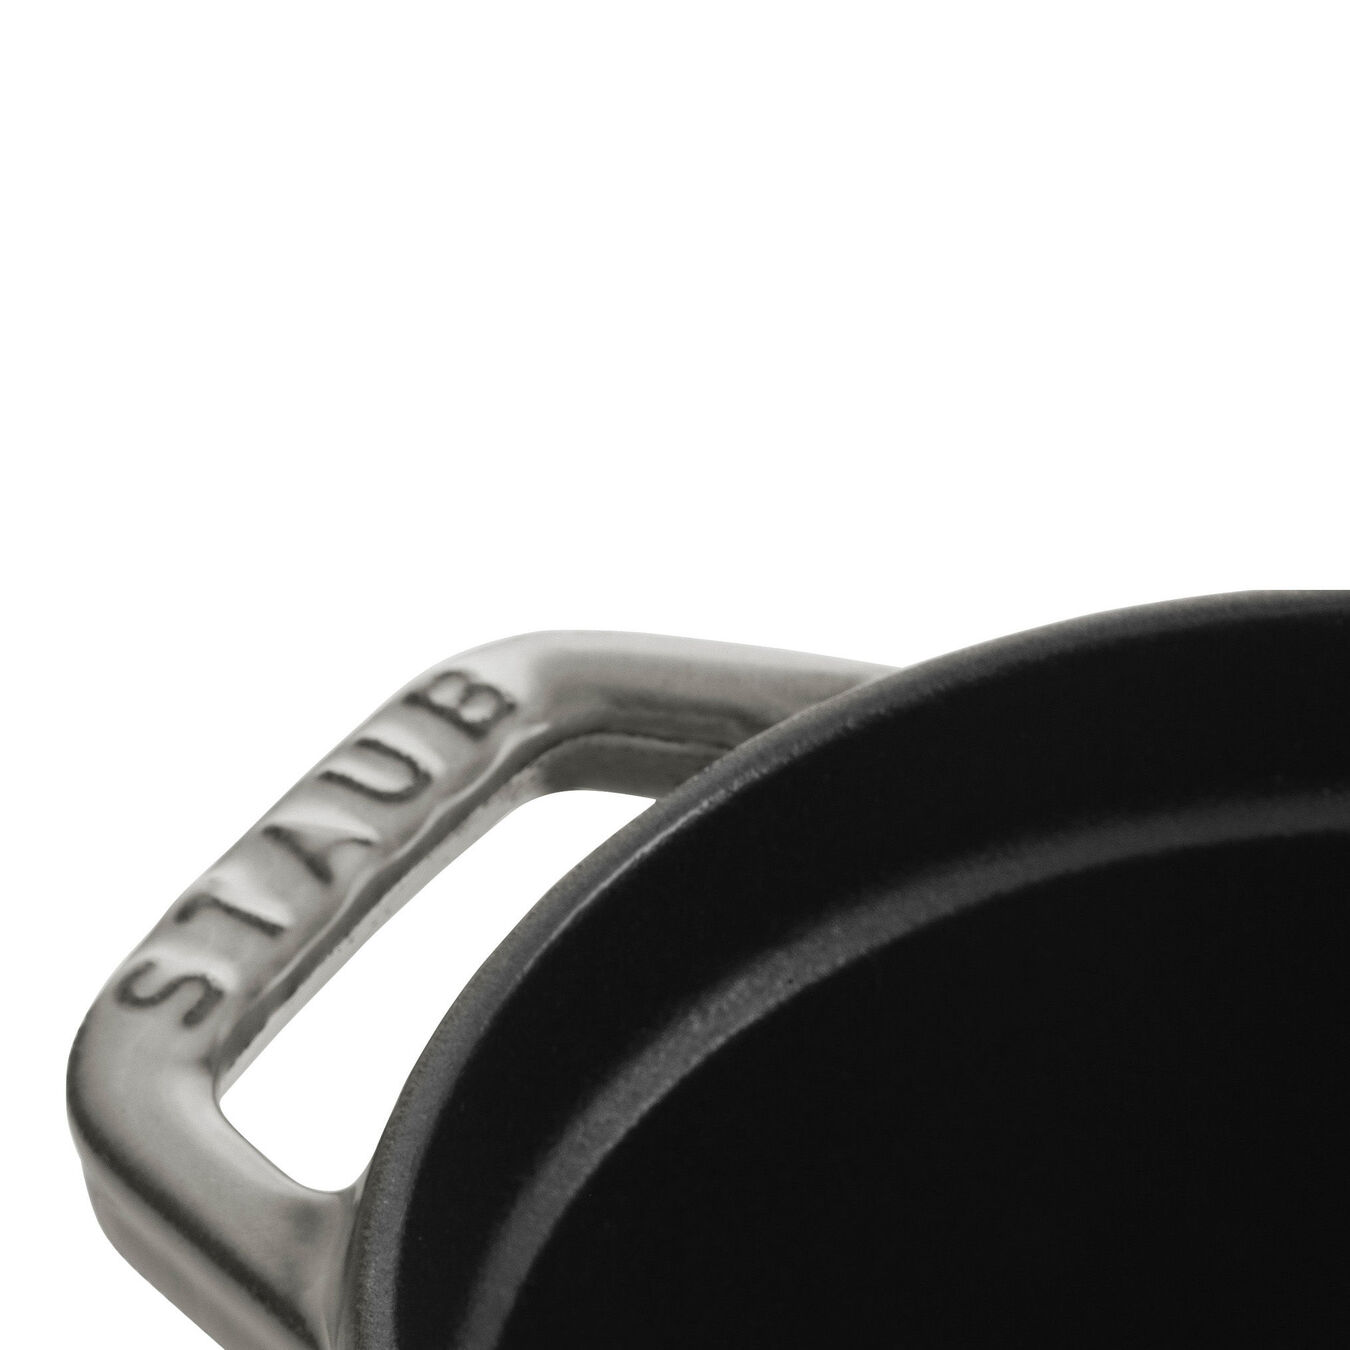 Caçarola 17 cm, oval, Cinza grafite, Ferro fundido,,large 4